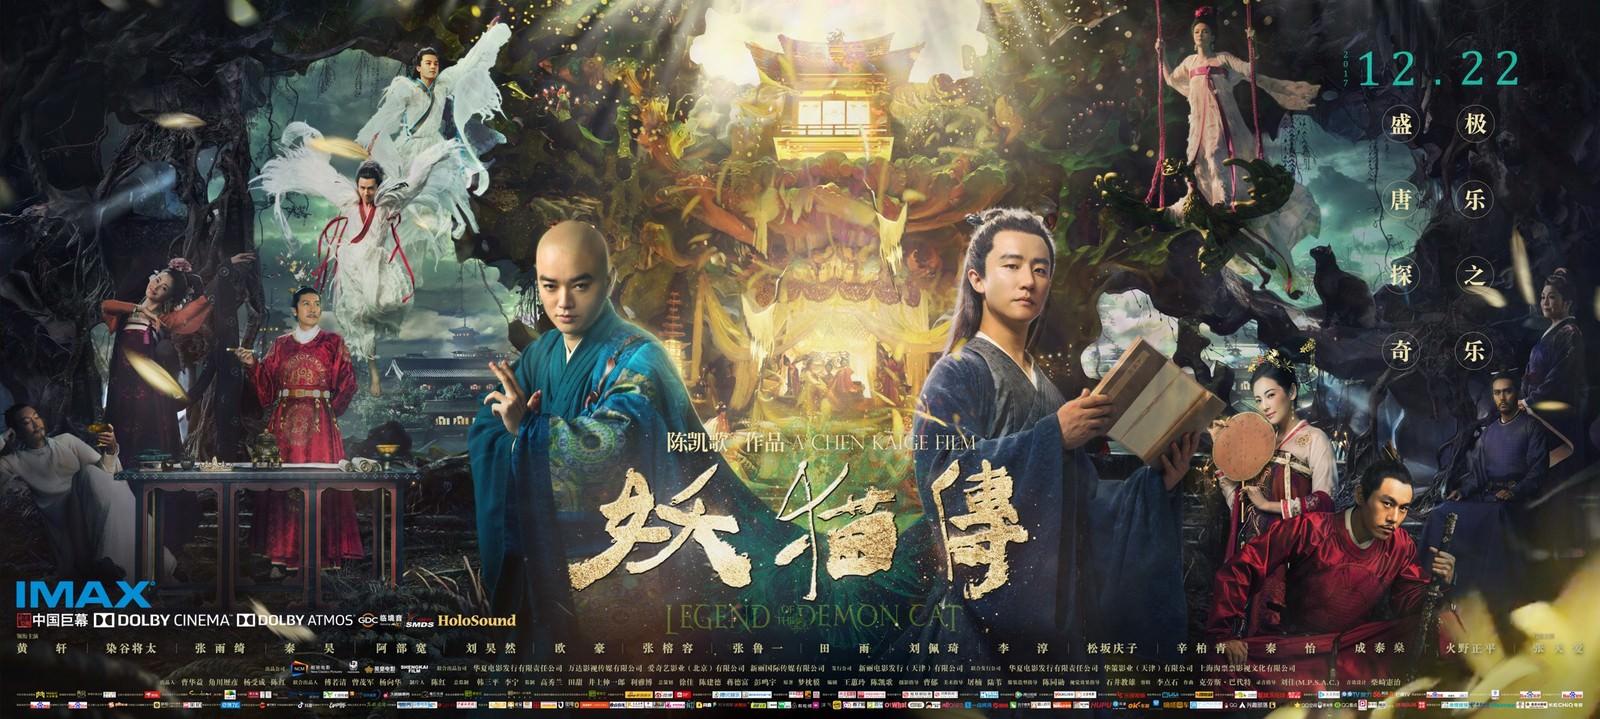 Movie, 妖猫传(中國, 2017年) / 妖貓傳(台灣) / Legend of the Demon Cat(英文), 電影海報, 中國, 橫版